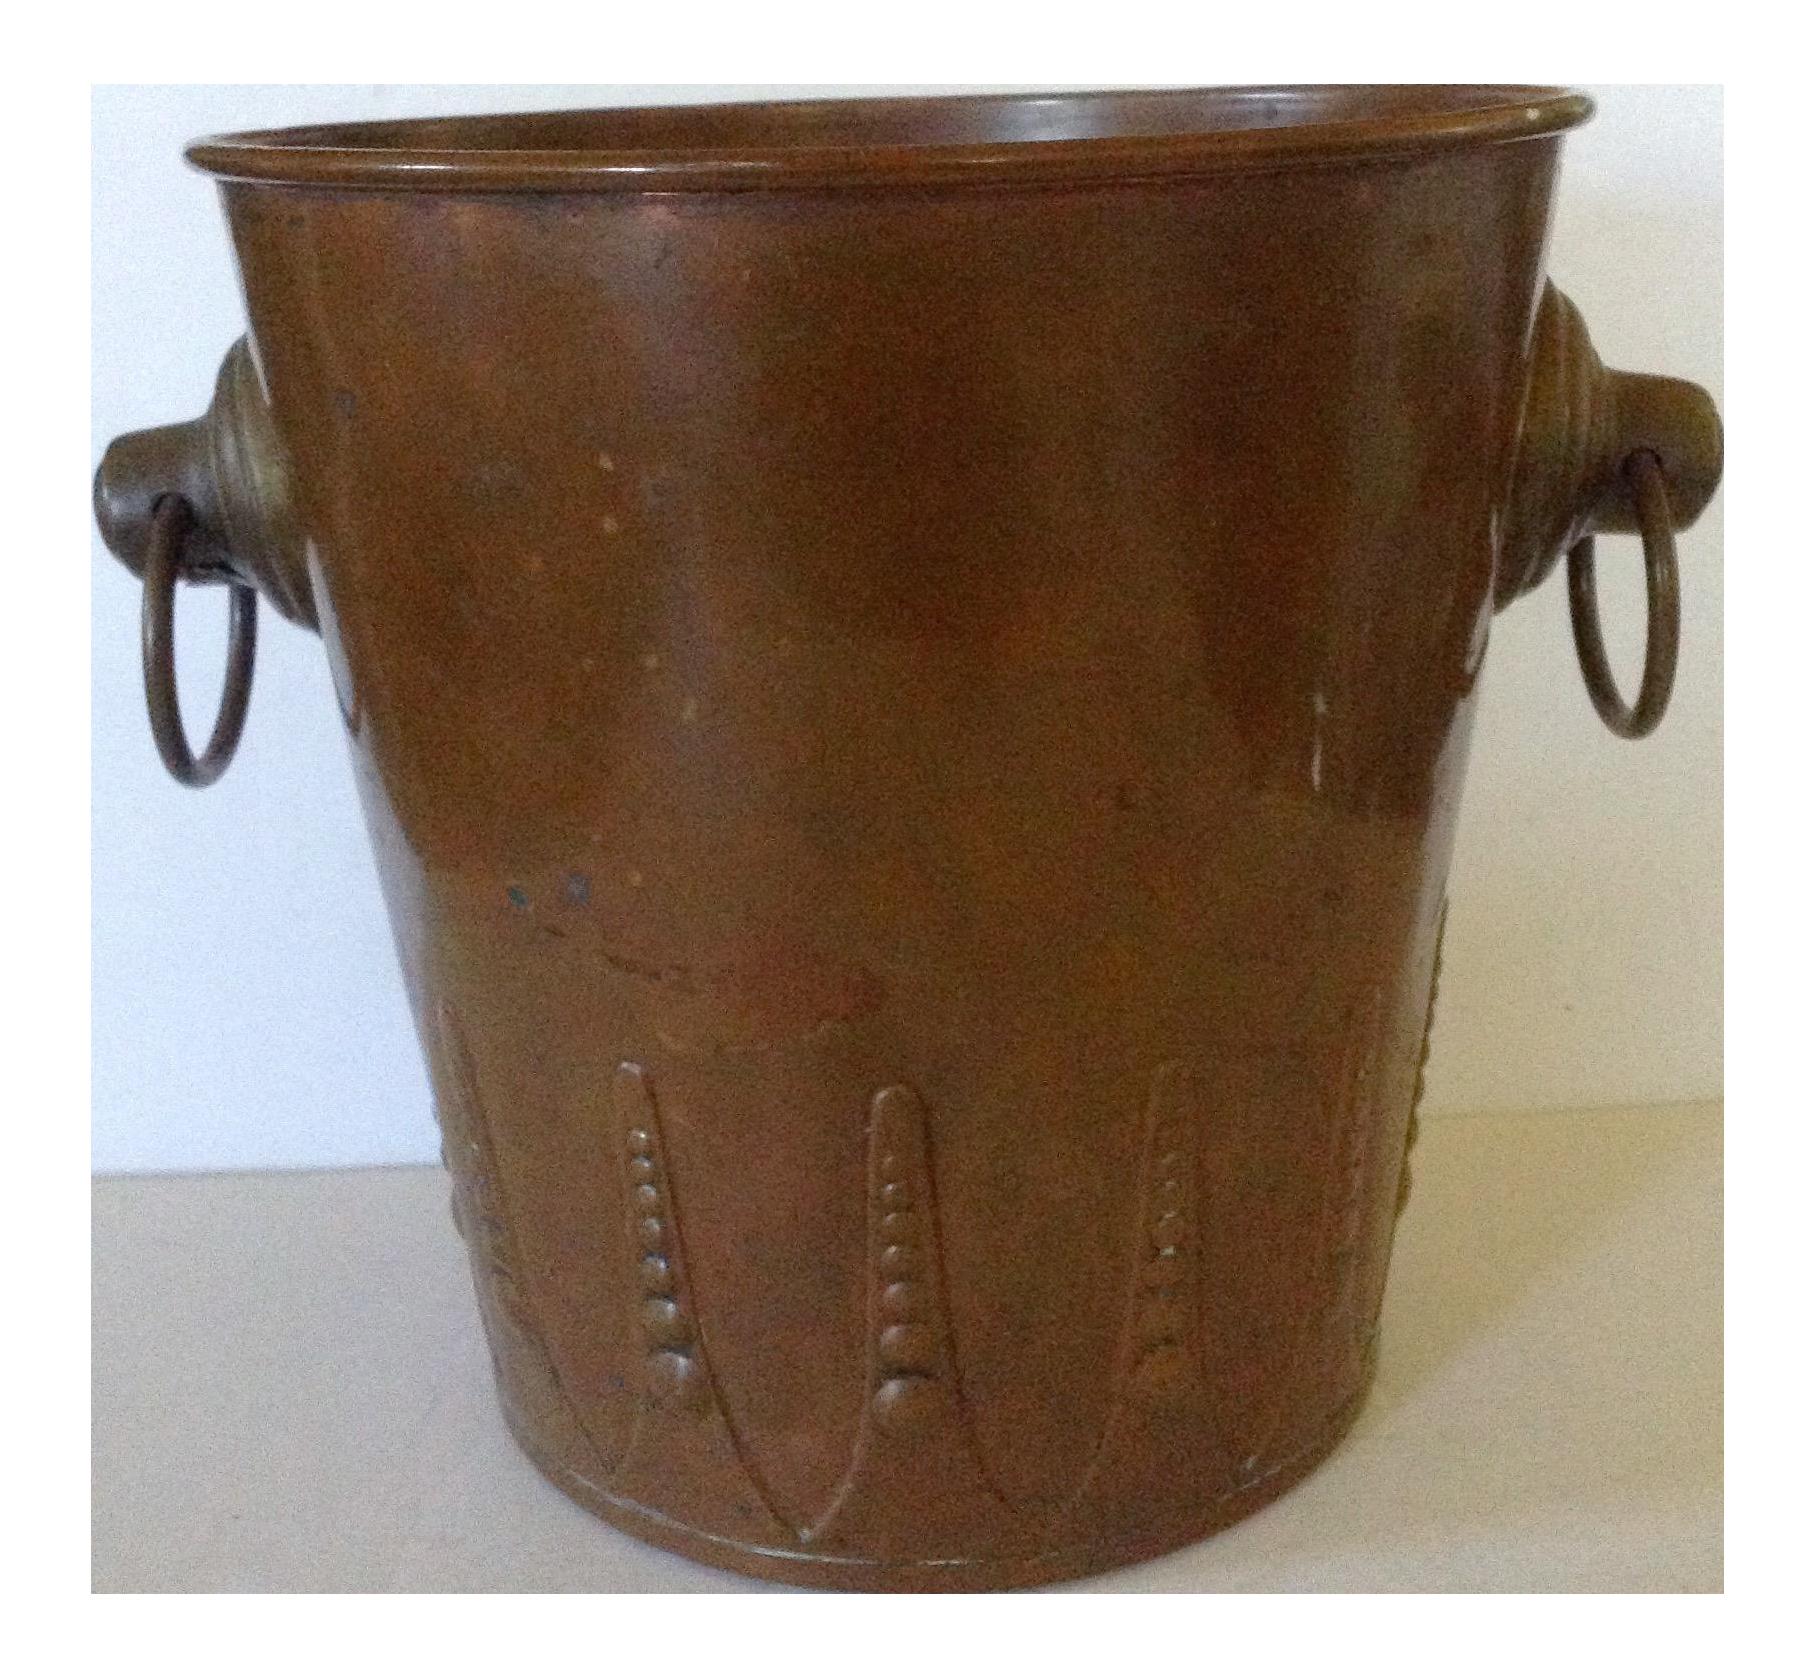 French Copper Ice Bucket on Chairish.com